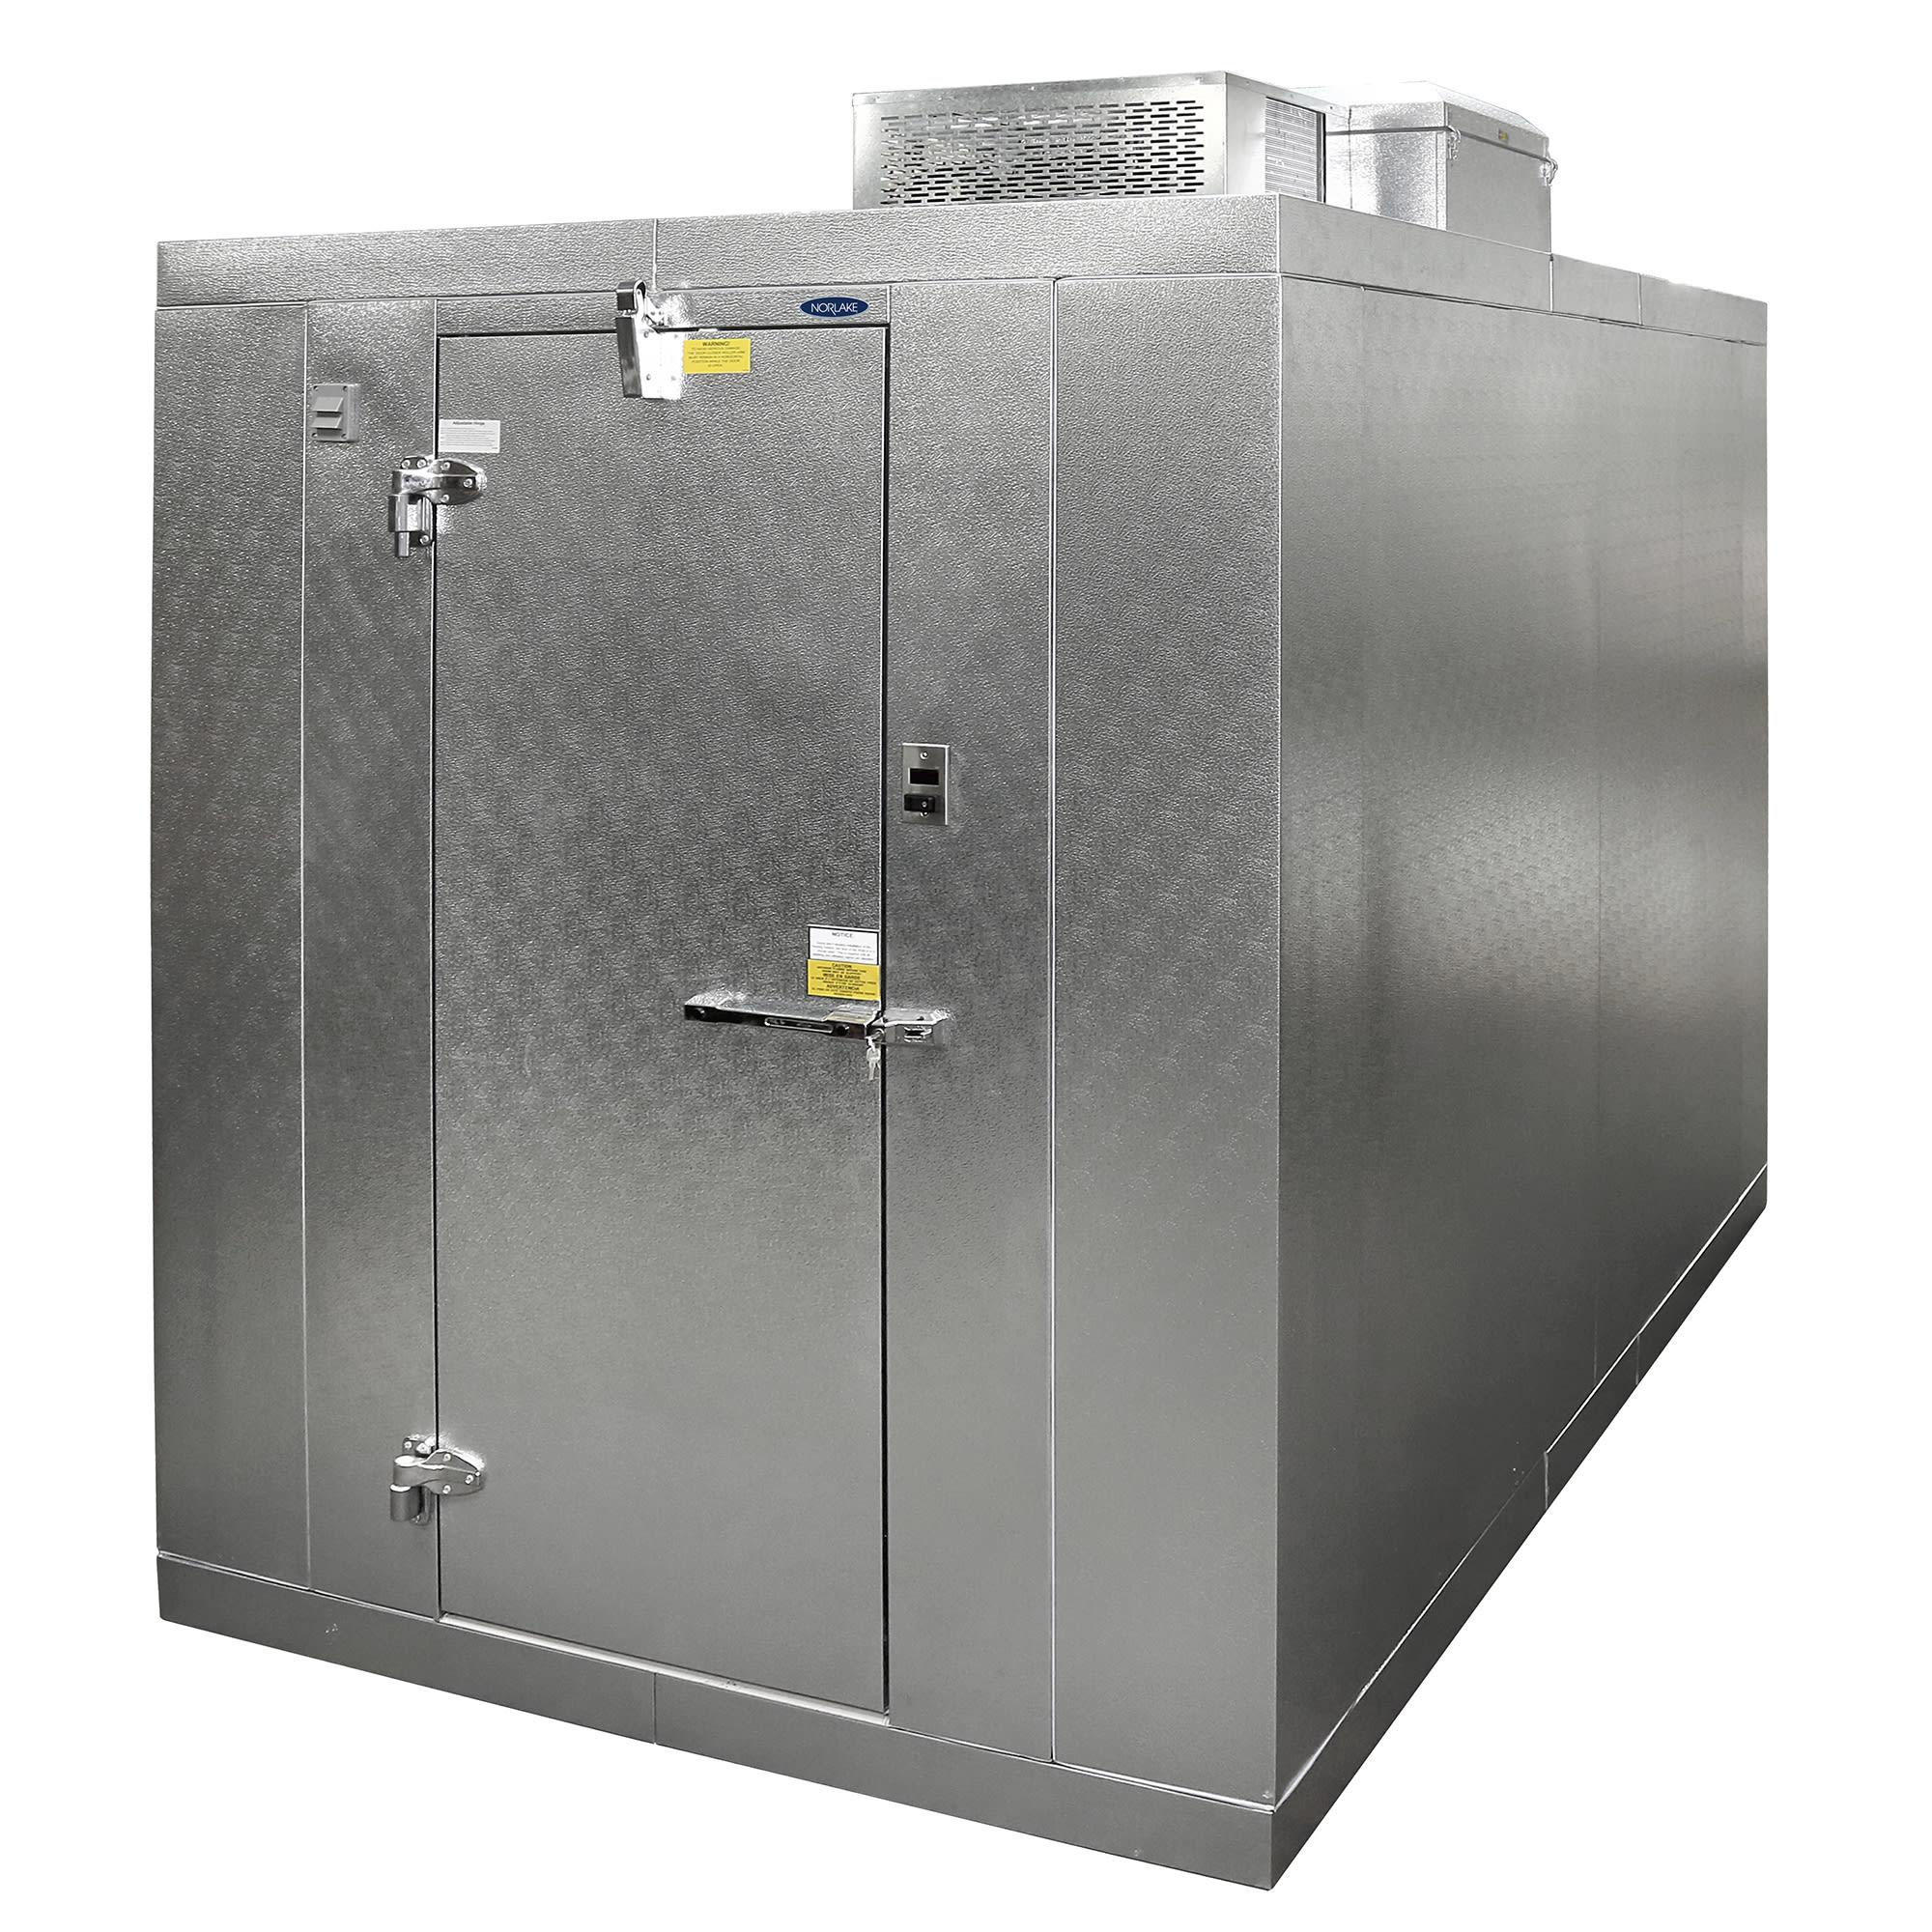 Nor-Lake KLB7468-C R Indoor Walk-In Refrigerator w/ Top M...